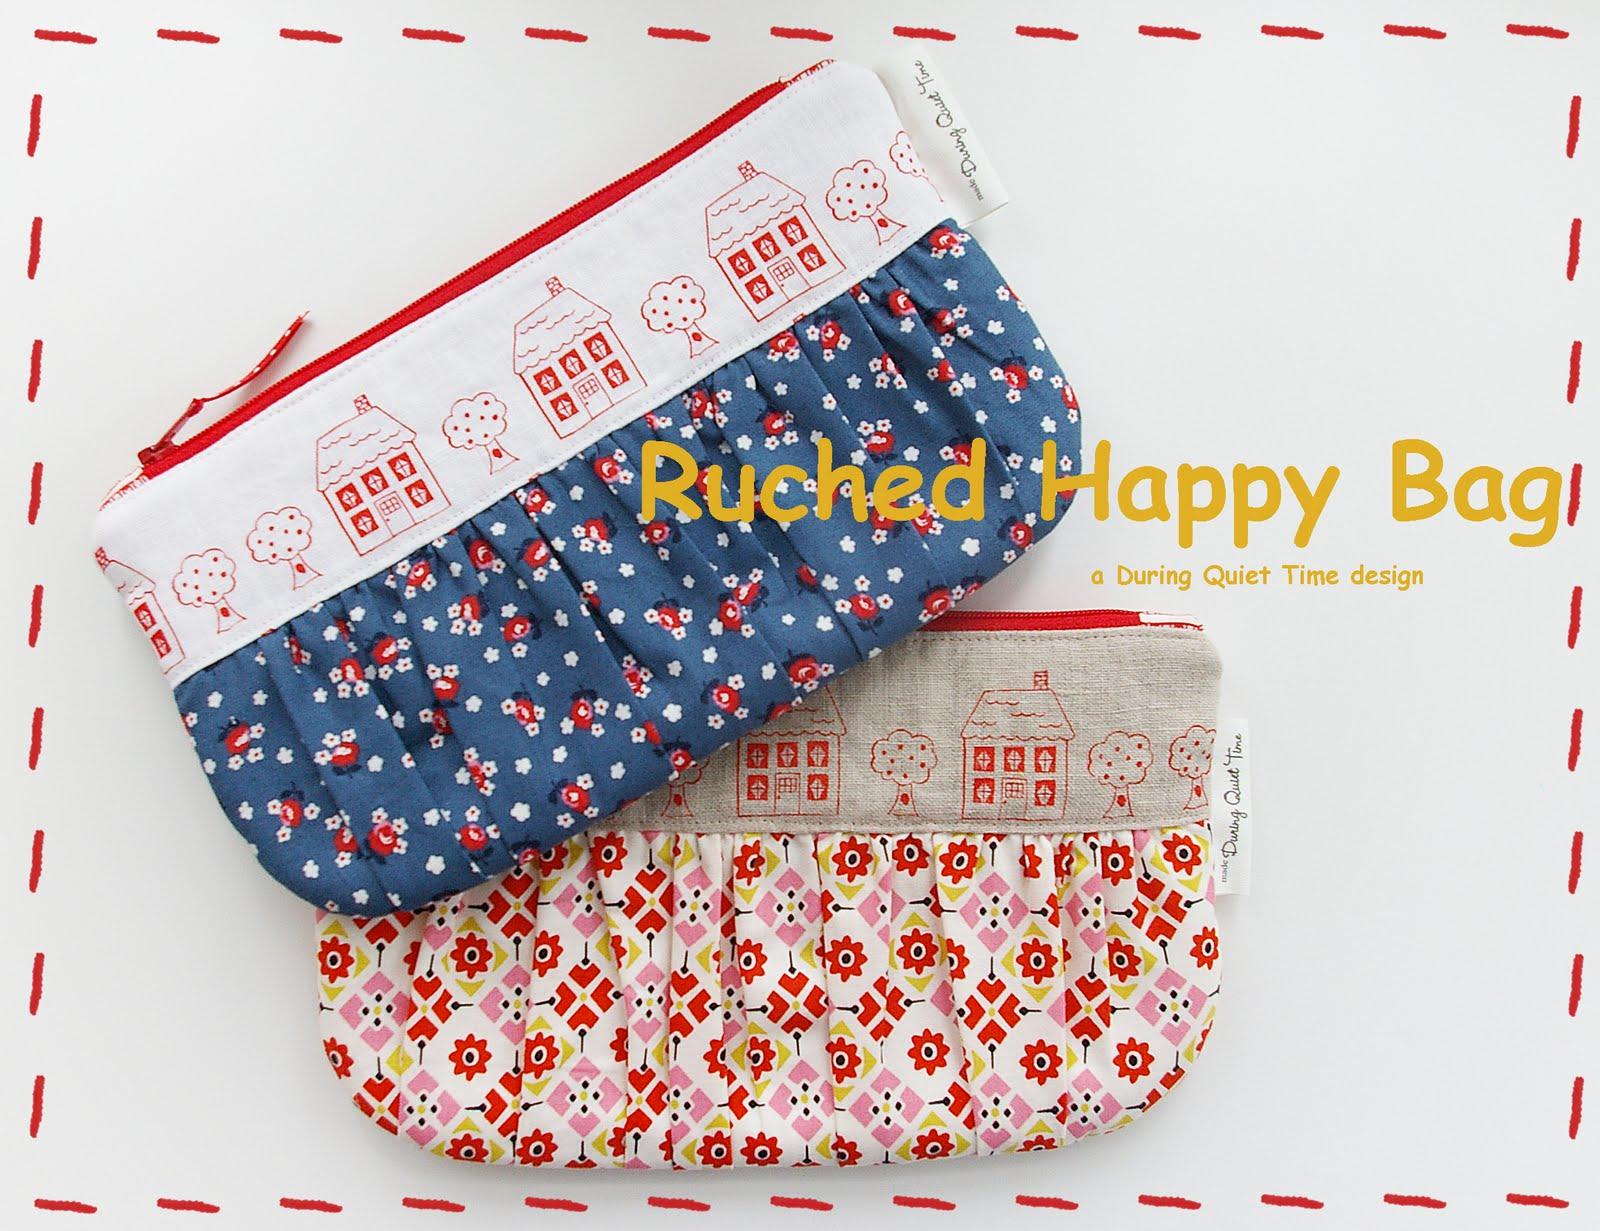 Pocketbook Patterns : Scalloped Dresden Bag Free Pattern